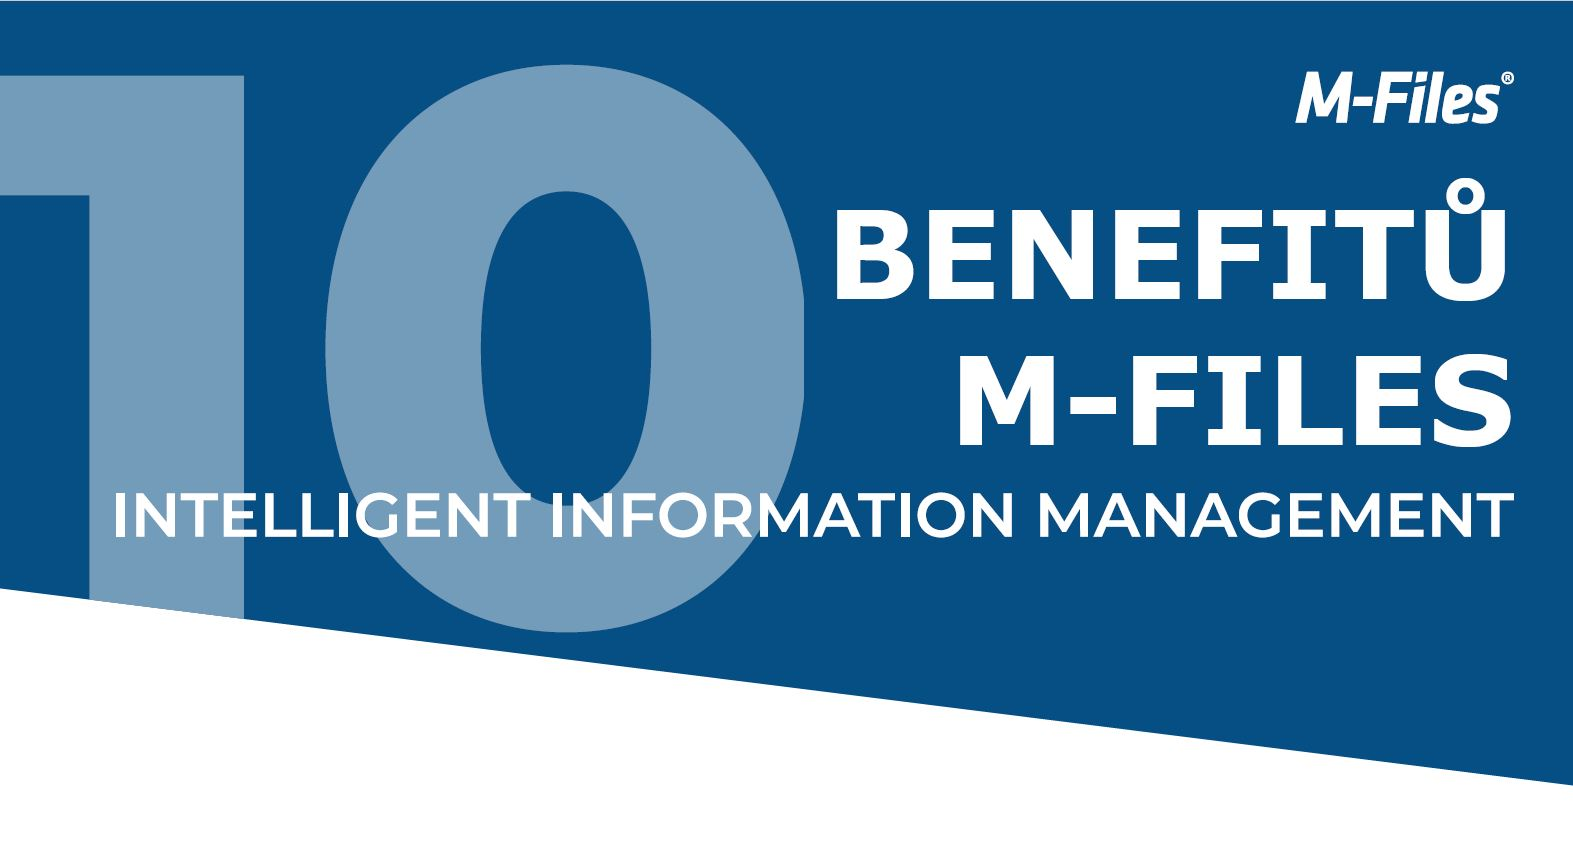 M-Files 10 benefitů